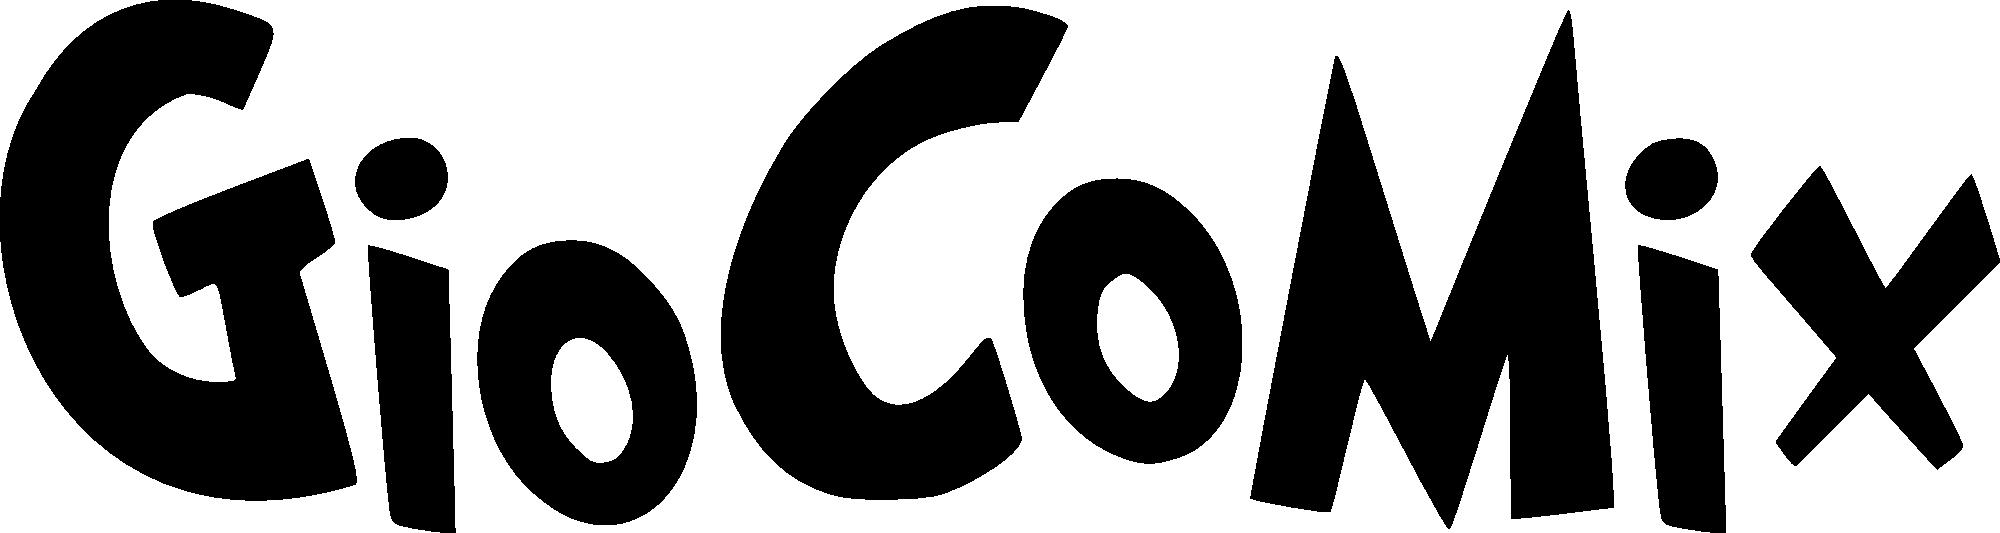 GioCoMix 2015